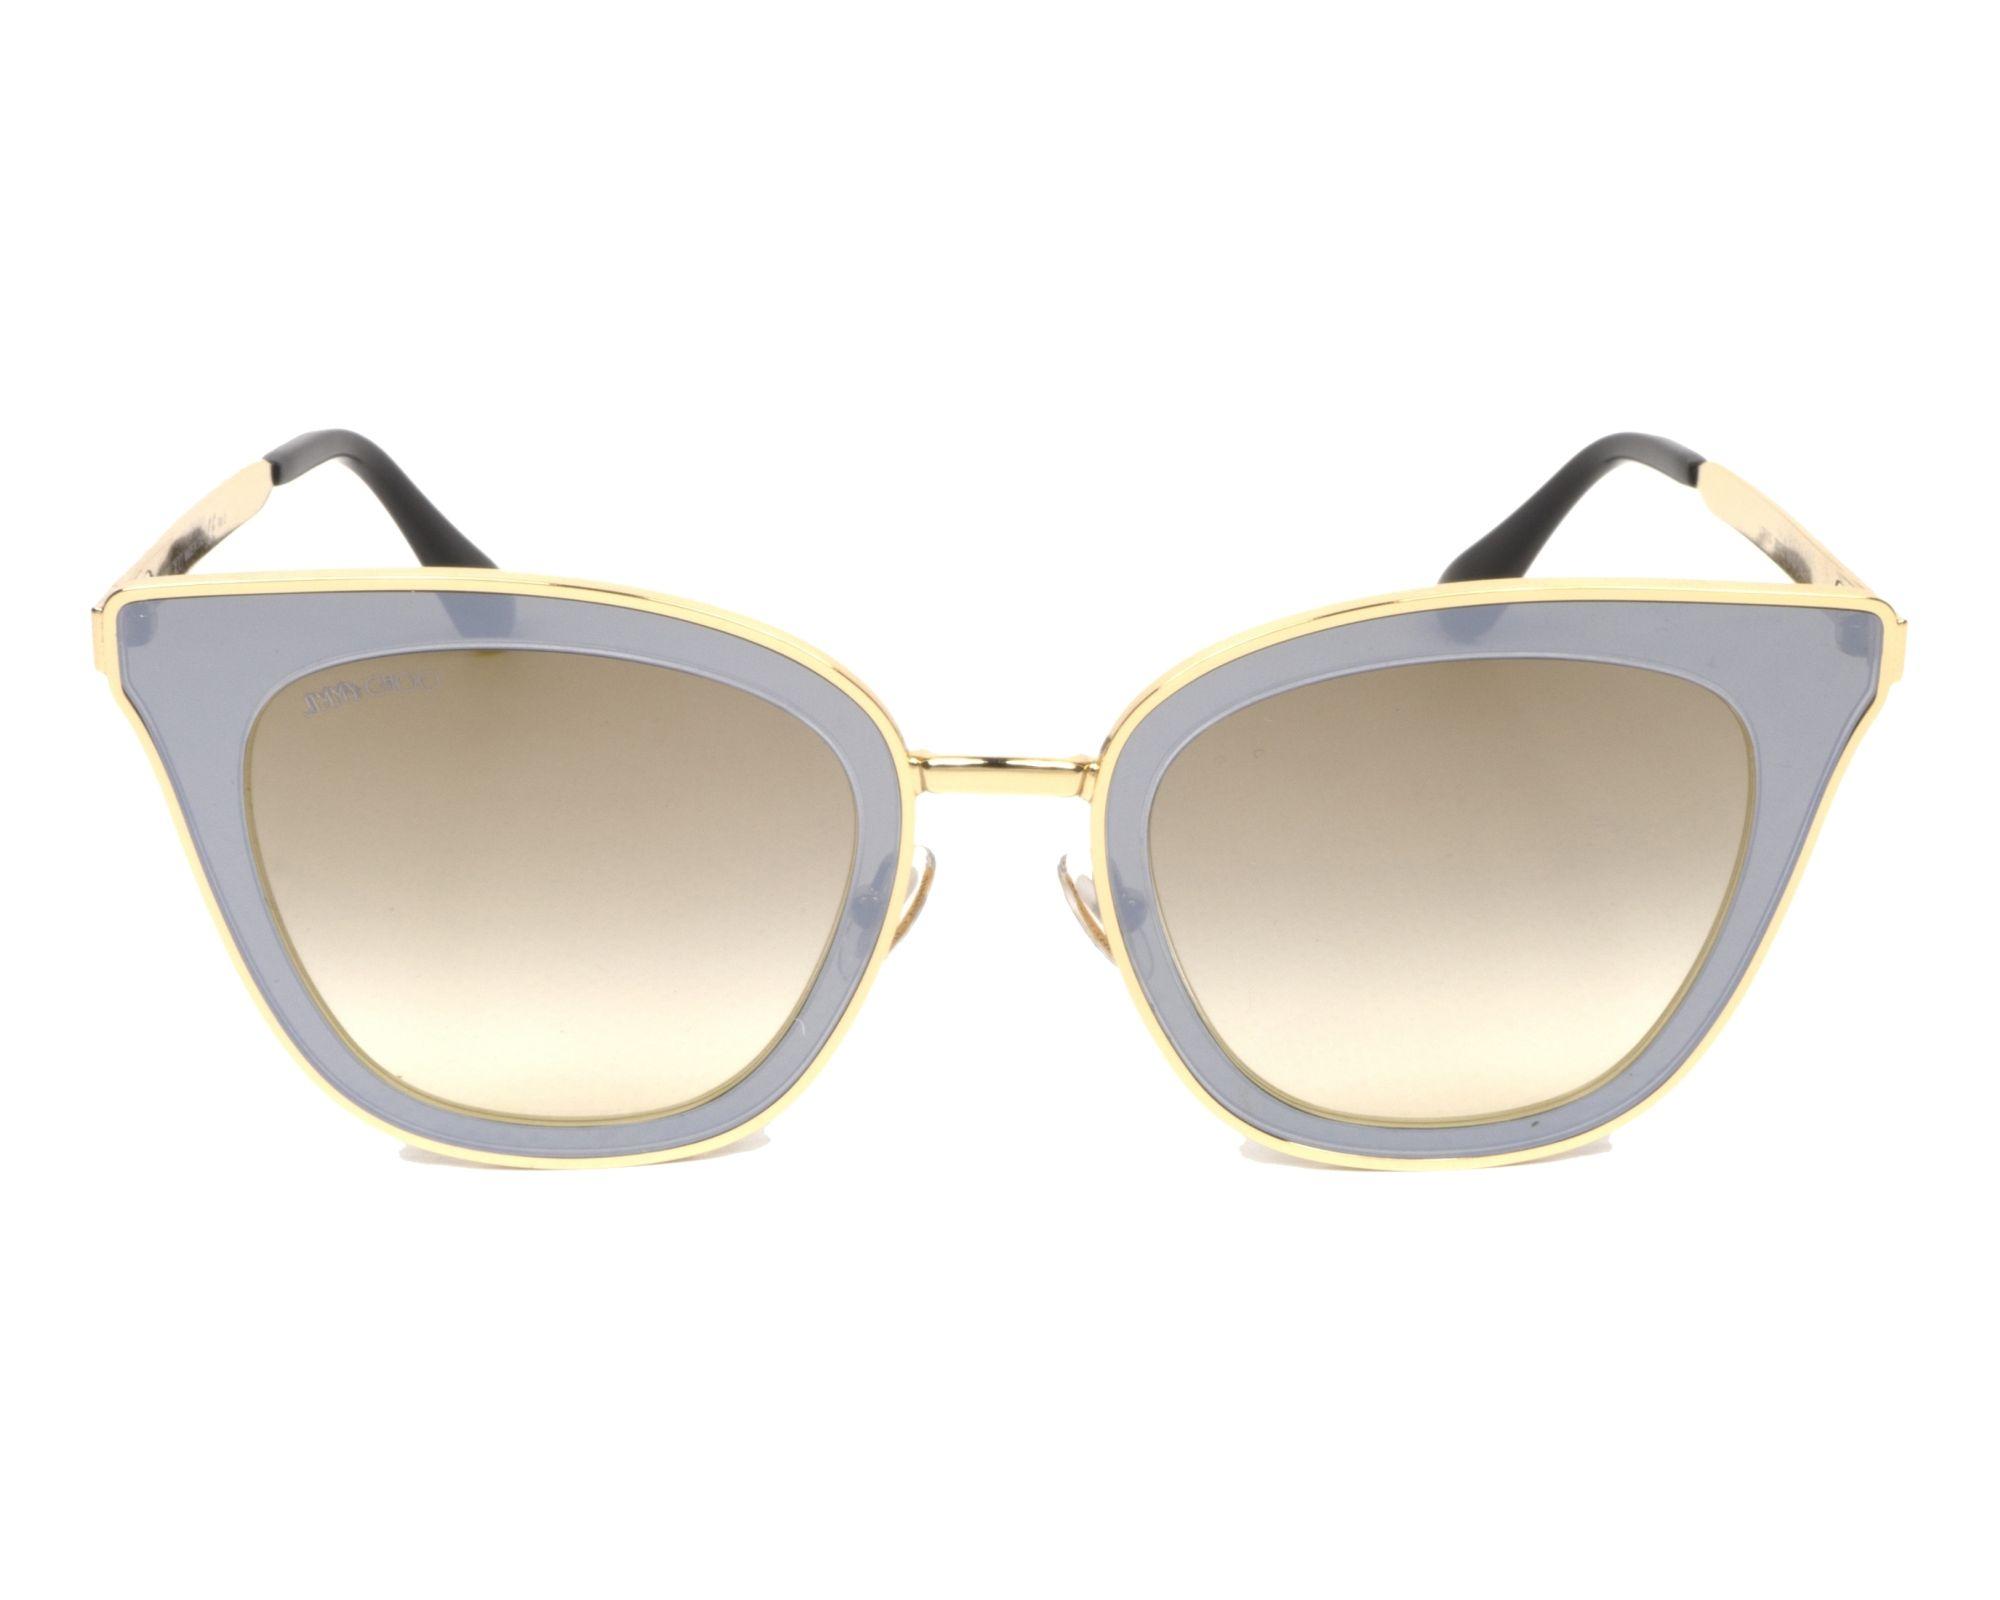 Lory 49 sunglasses - Blue Jimmy Choo Eyewear qBZXoe